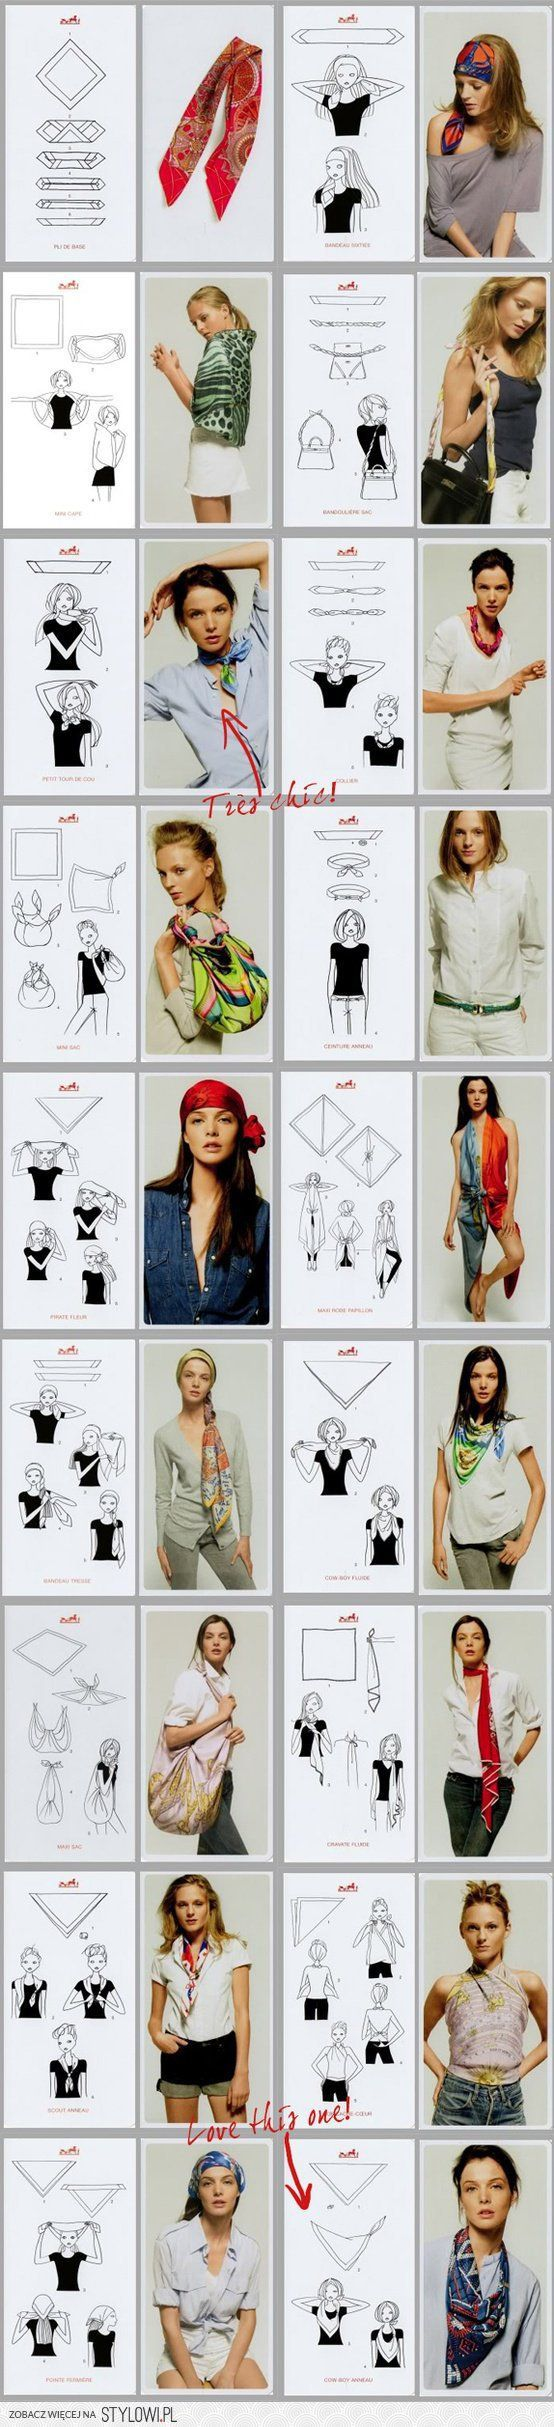 Creative ways how to style and wear a scarf/  Dažādi radoši veidi, kā nēsāt šalli